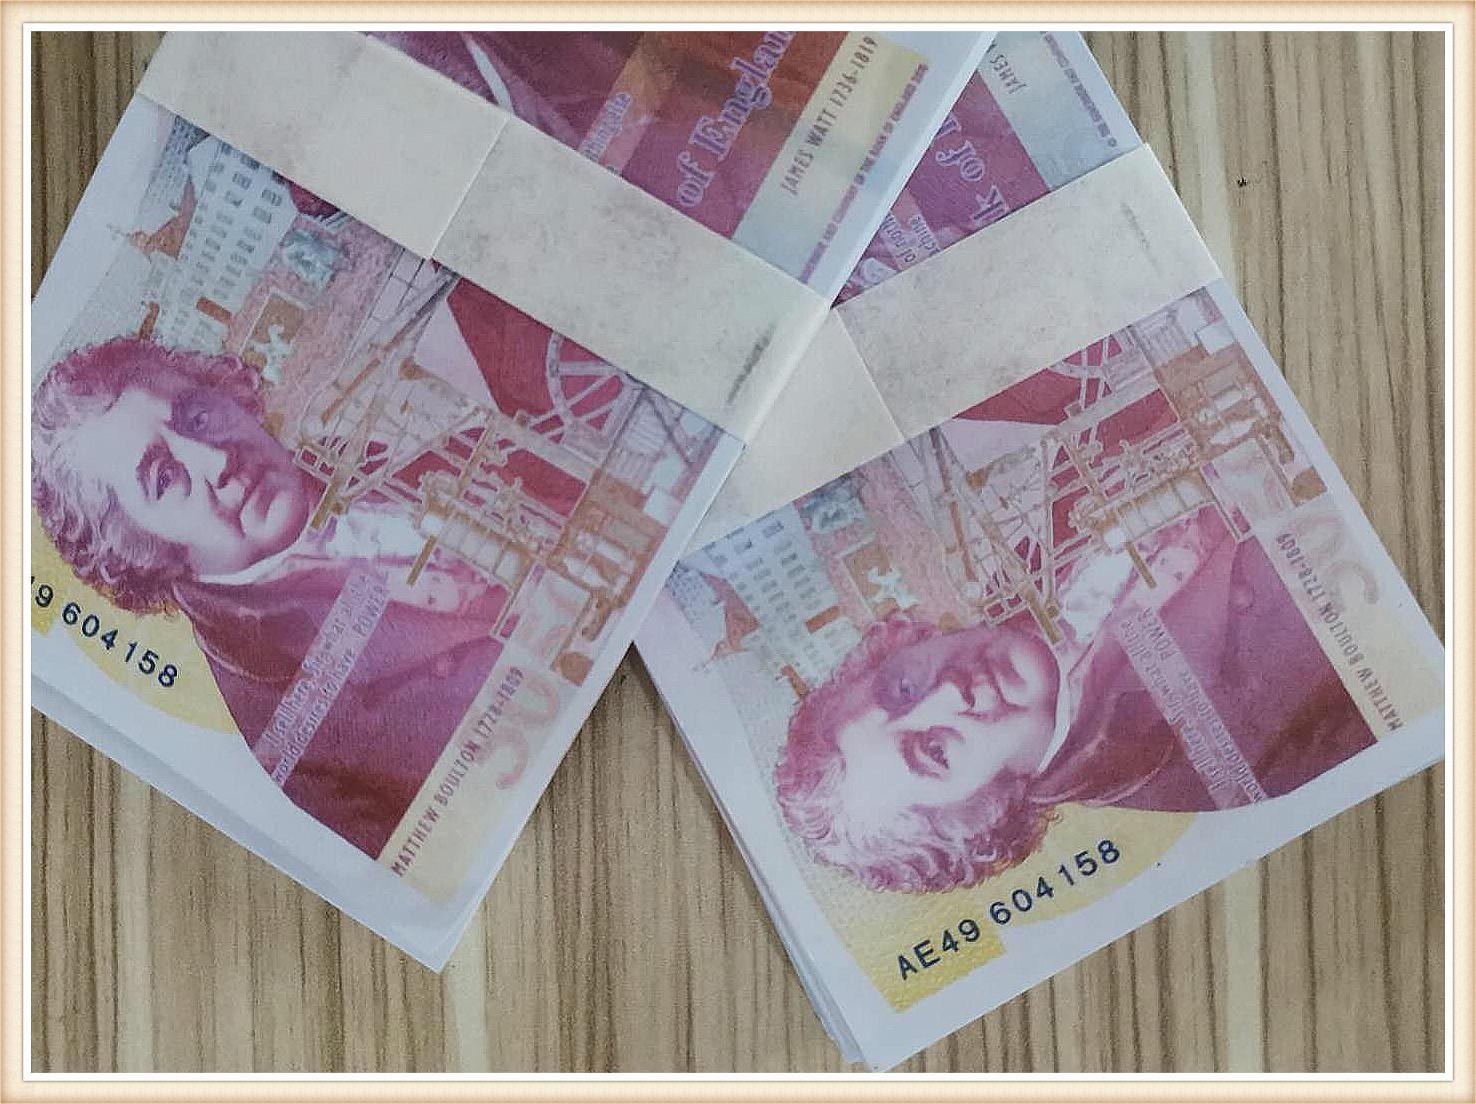 Billet de billet Cadeaux Cadeaux Billets de billet de banque Billet de billet de Billet